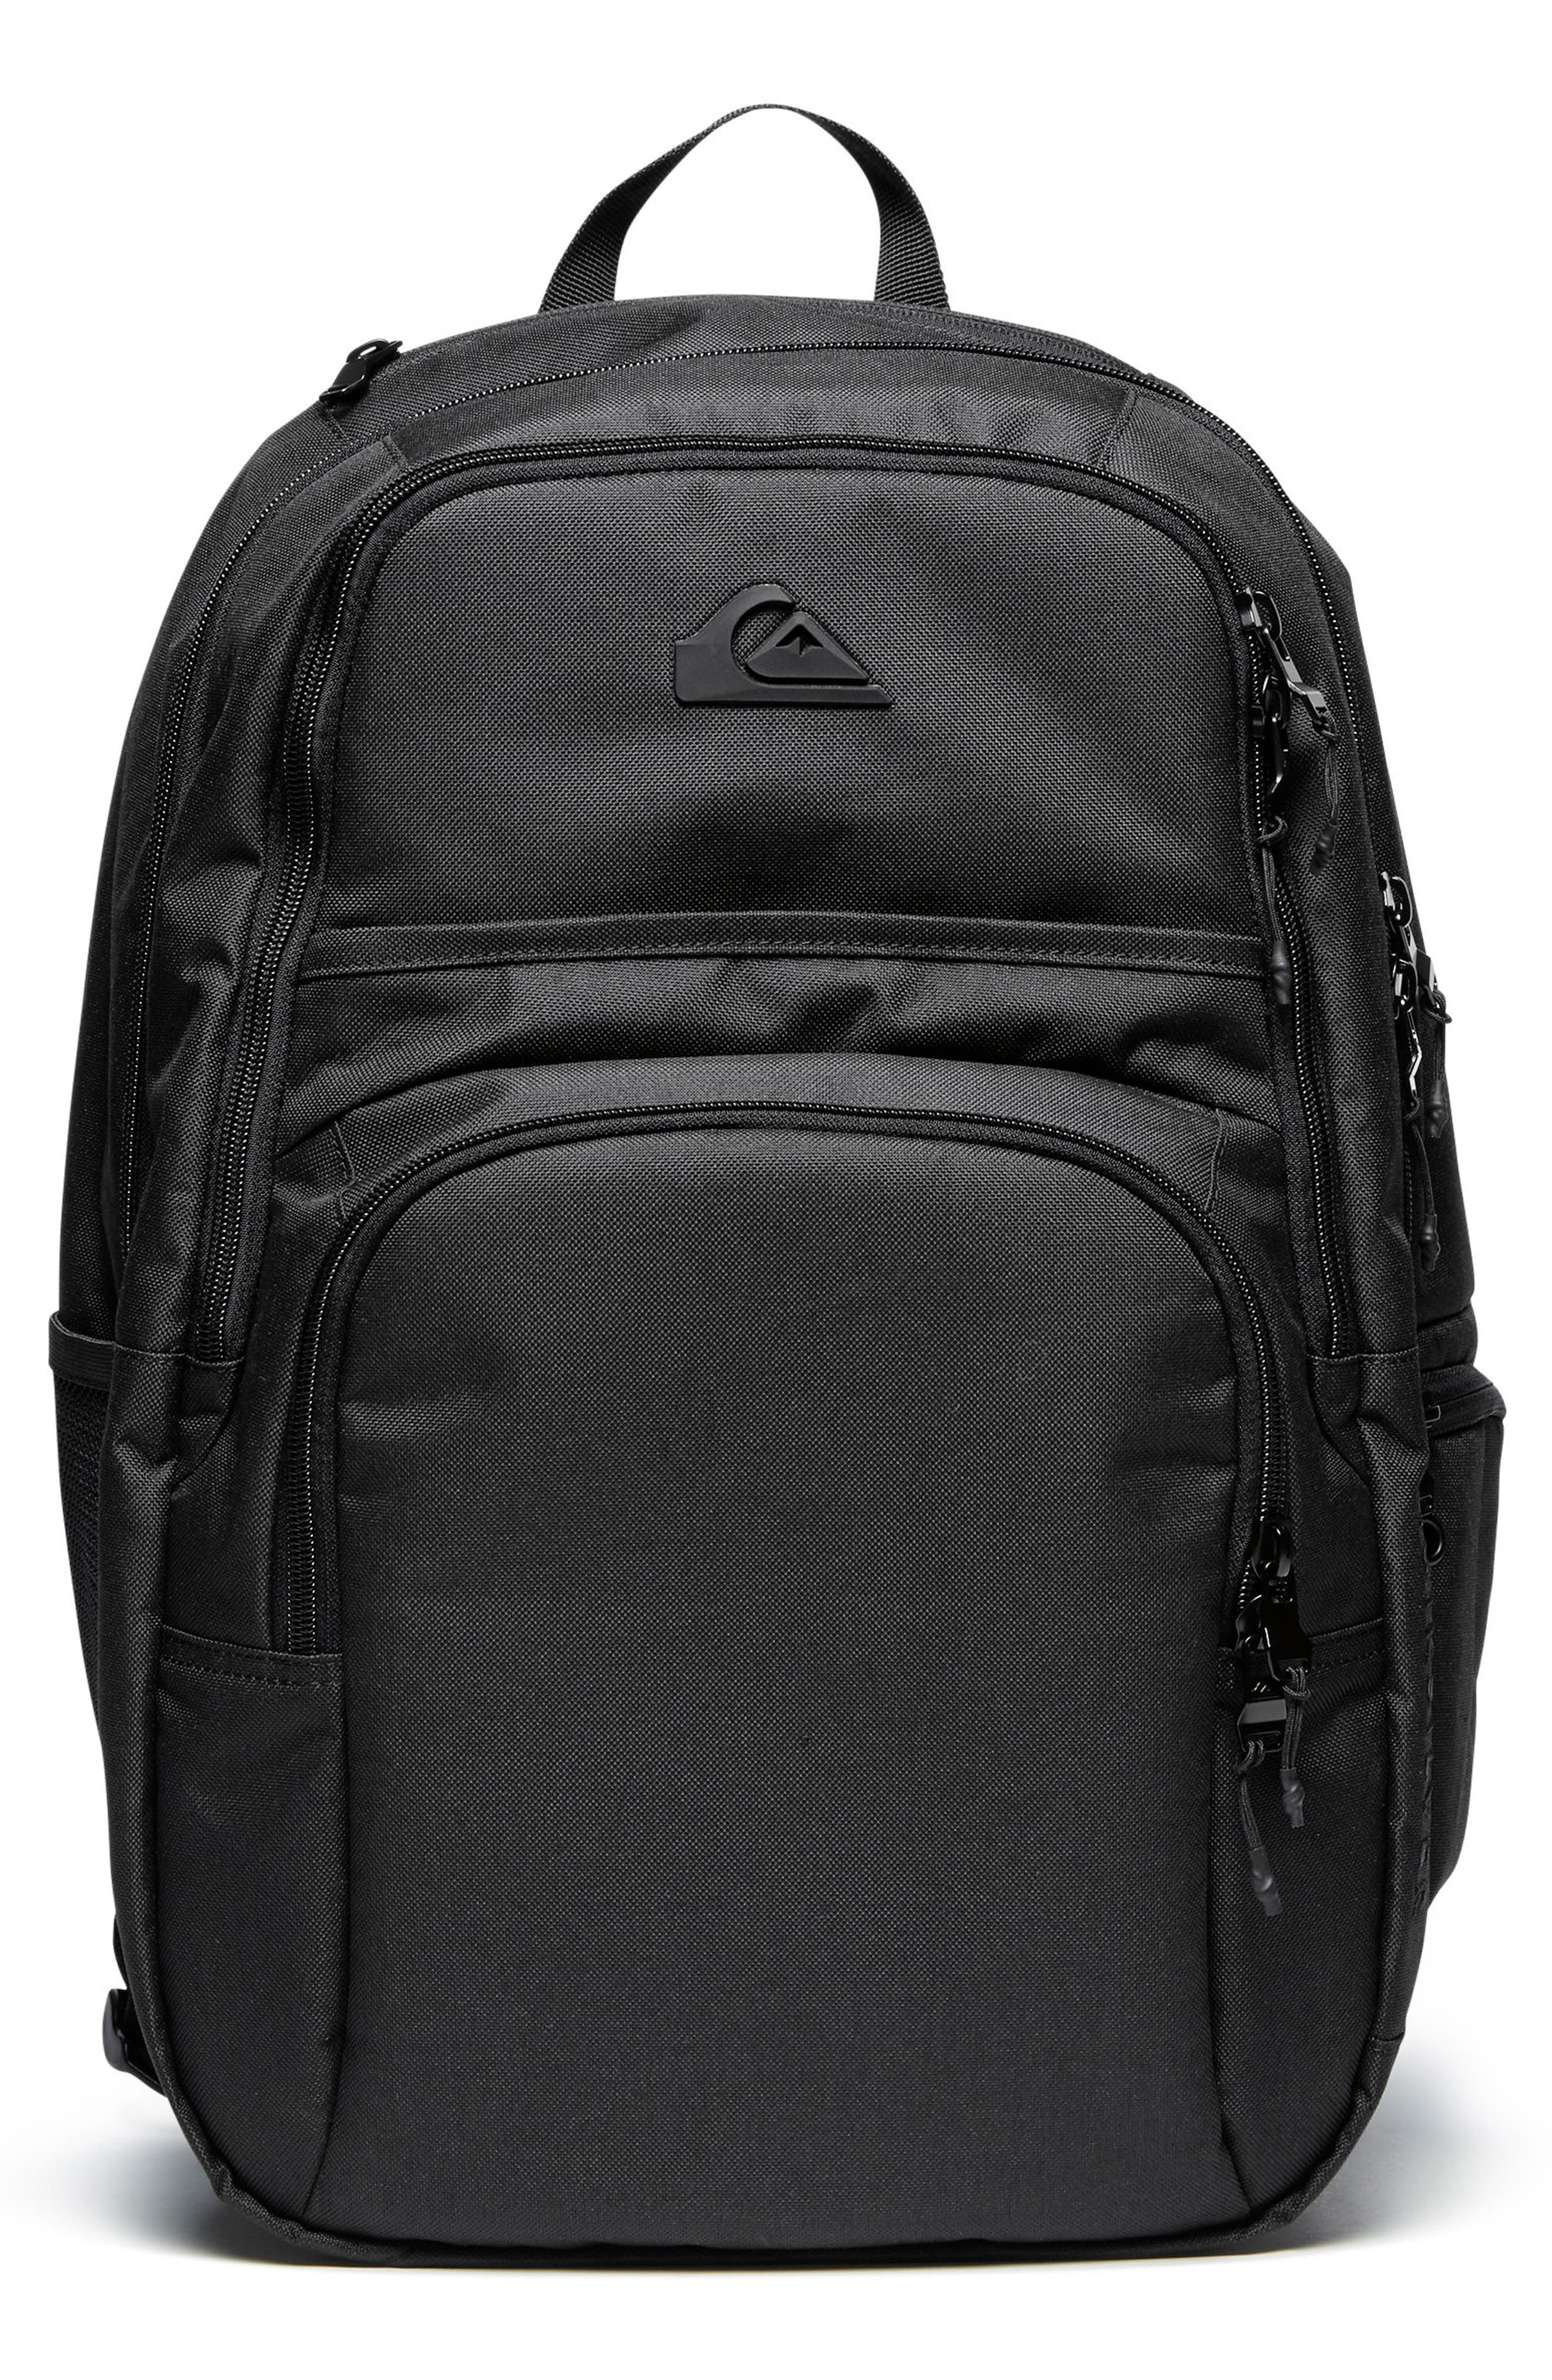 QUIKSILVER, Diaper Backpack, Main thumbnail 1, color, BLACK